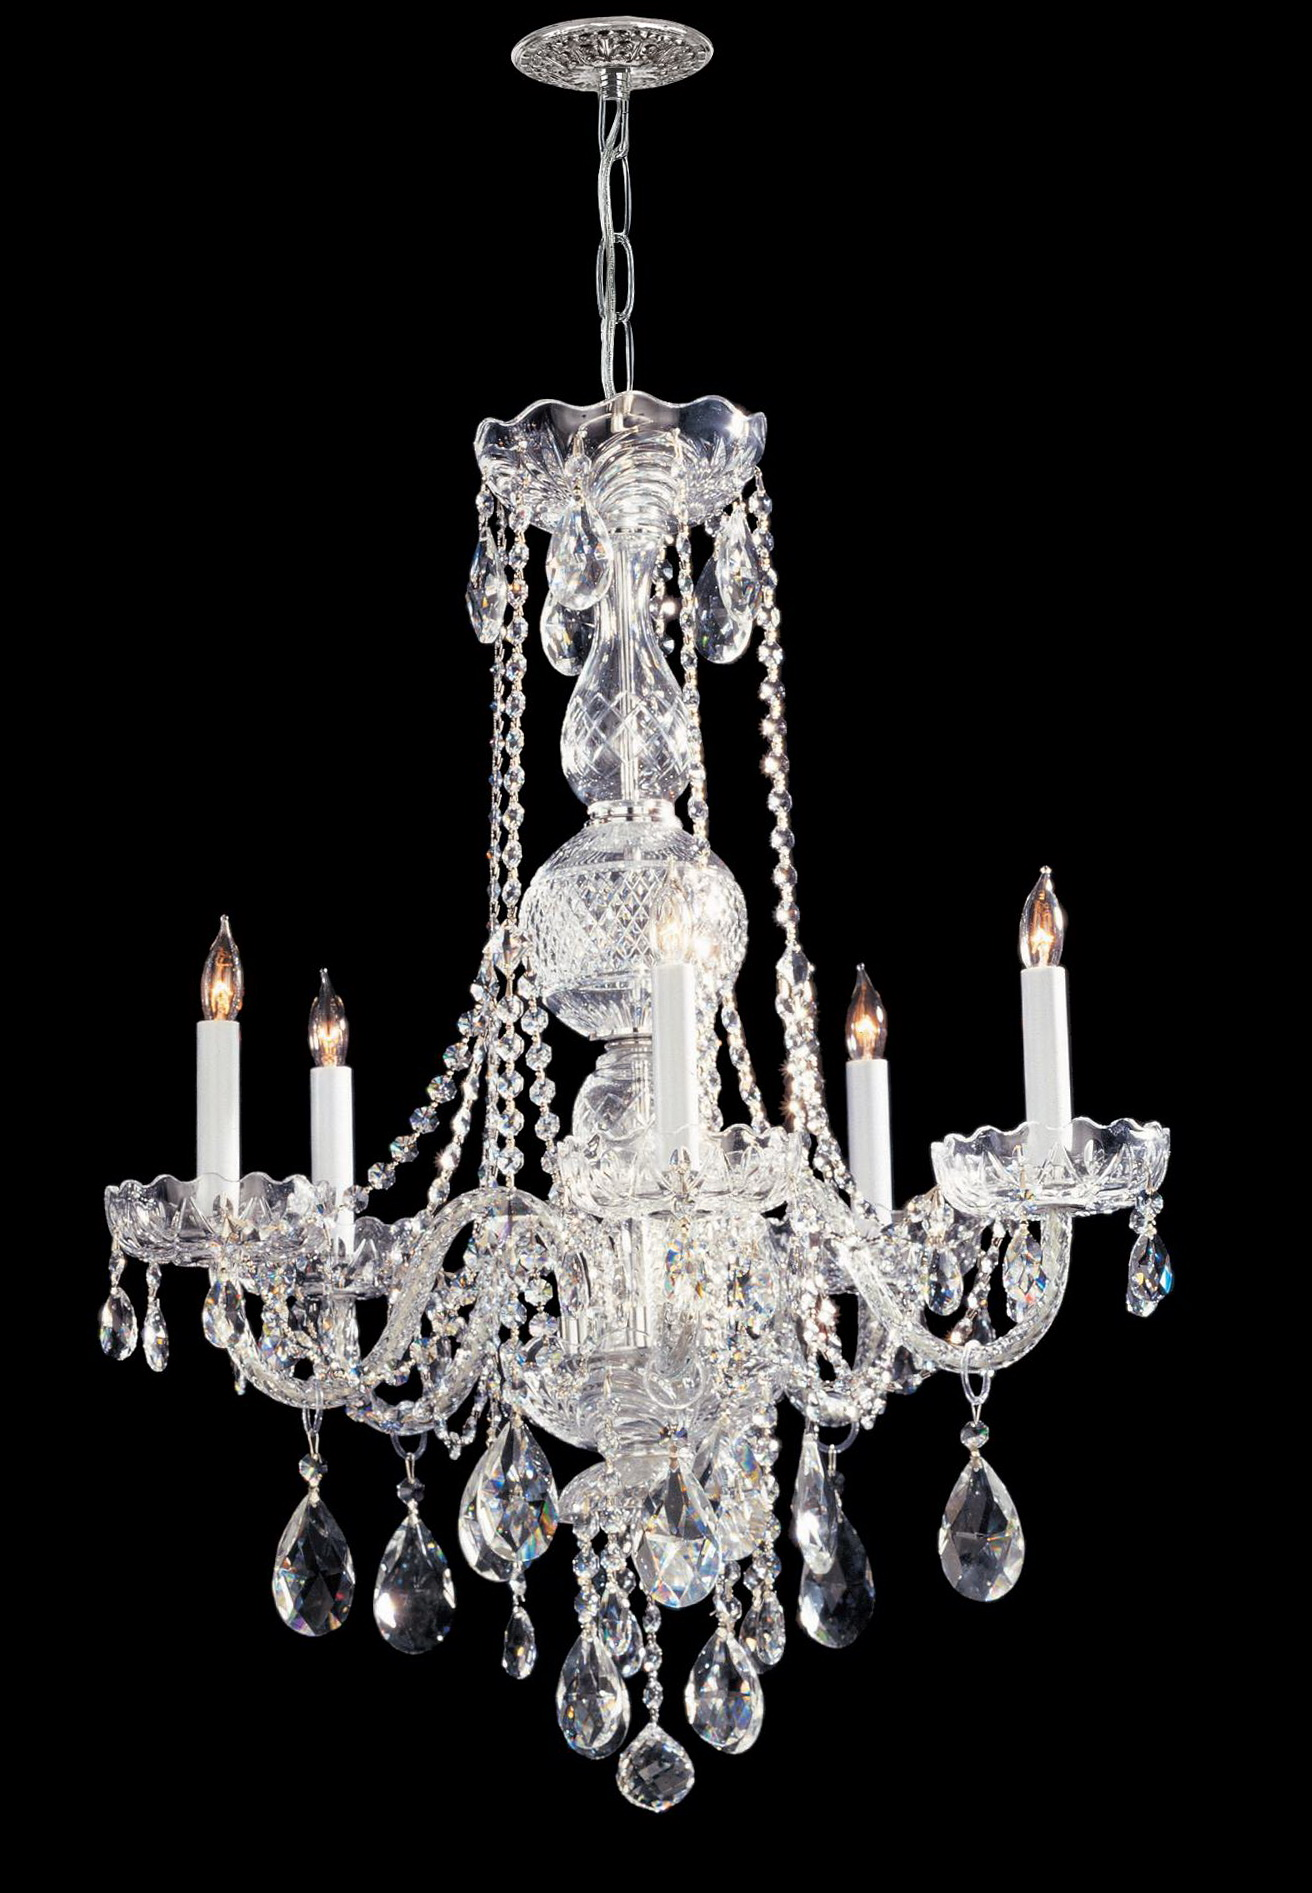 Swarovski Crystal Chandeliers Wholesale  Home Design Ideas